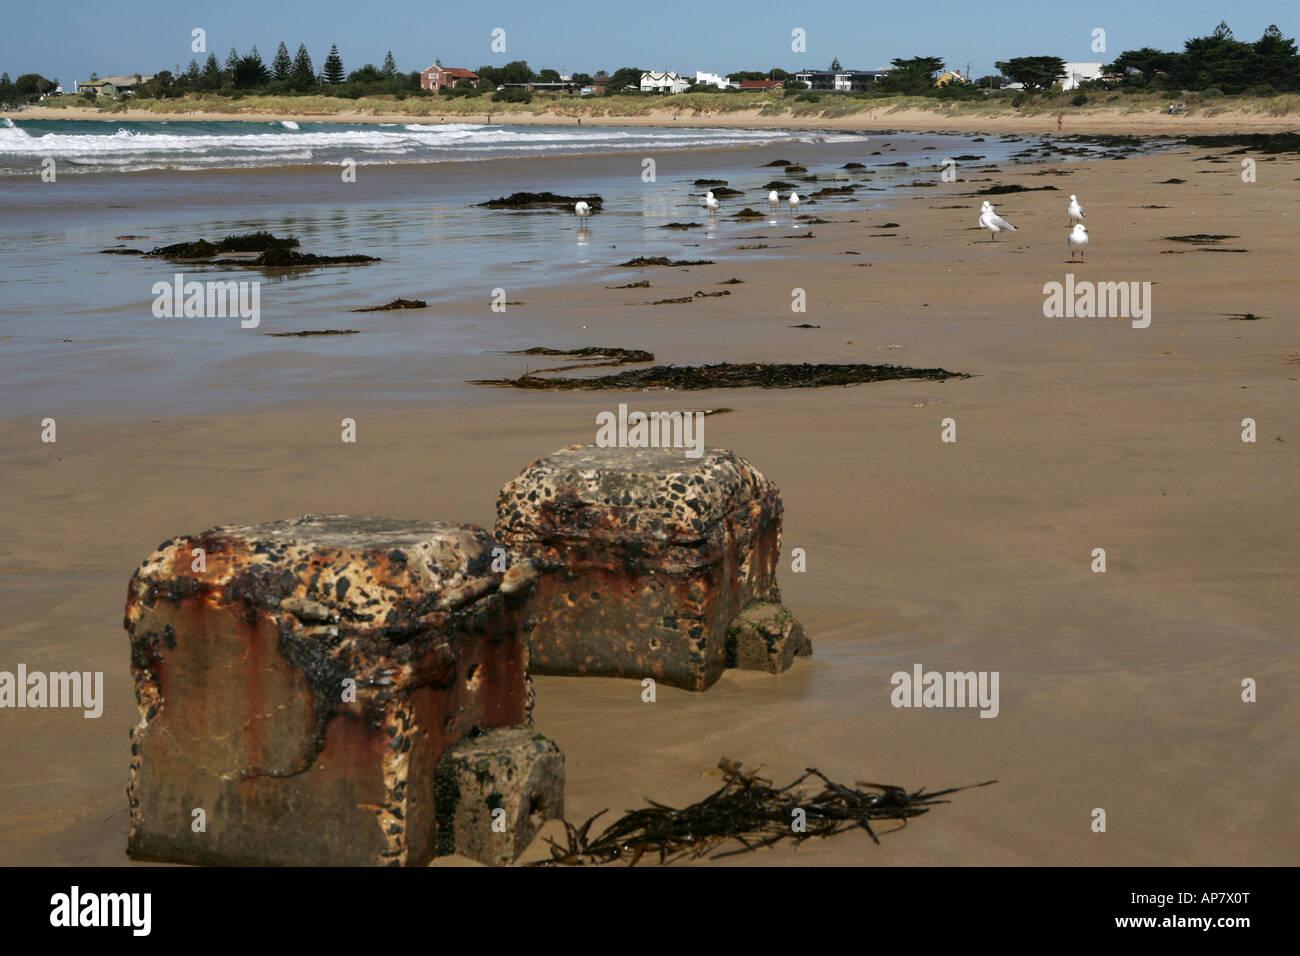 Apollo Bay Great Ocean Road Victoria Australia - Stock Image